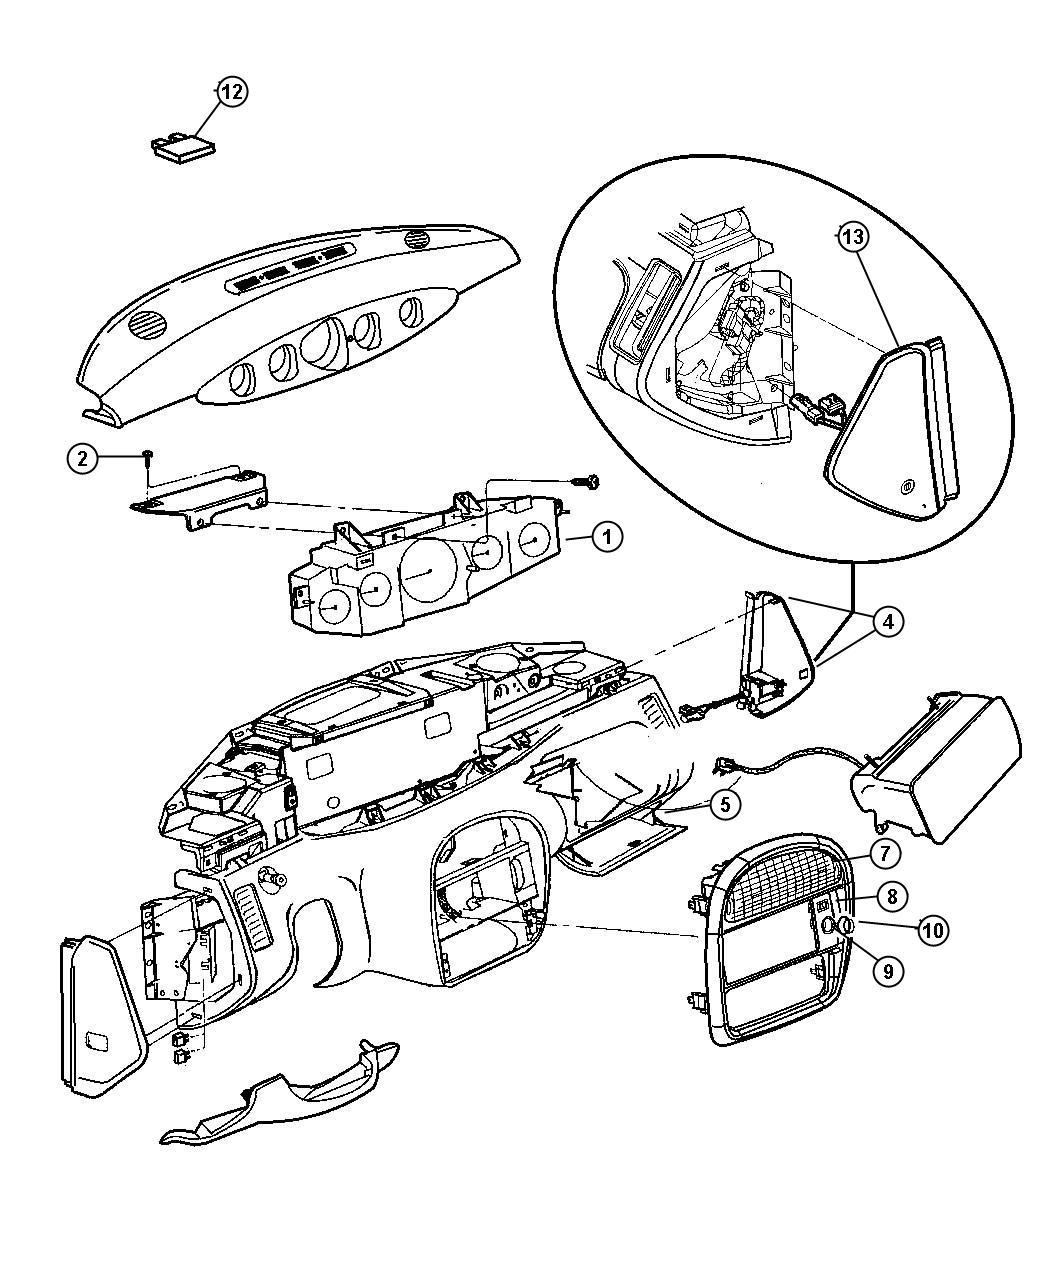 Plymouth Prowler Strap. Glove box. Canada, mexico. Trim